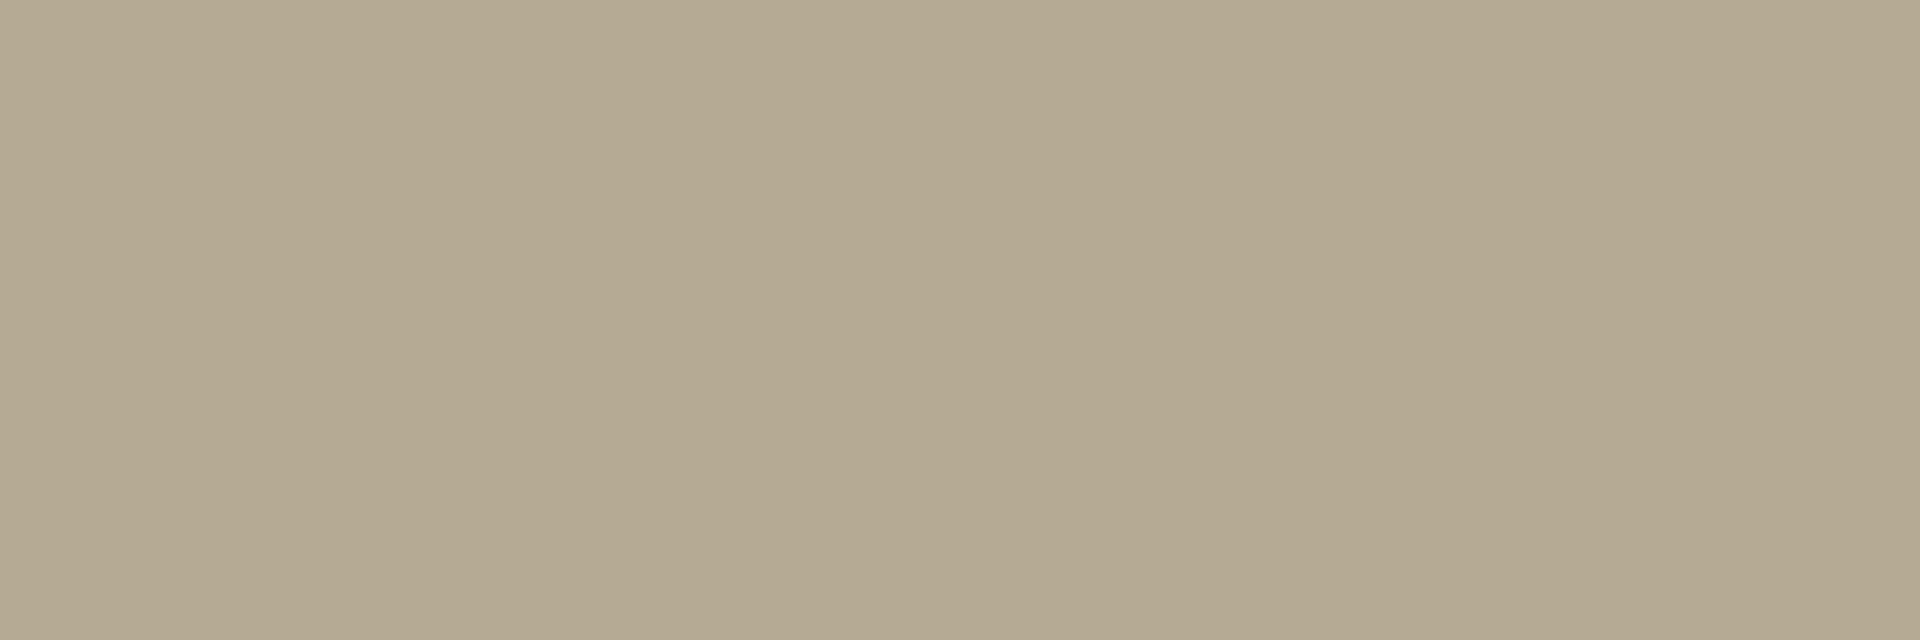 Granalt Ivory